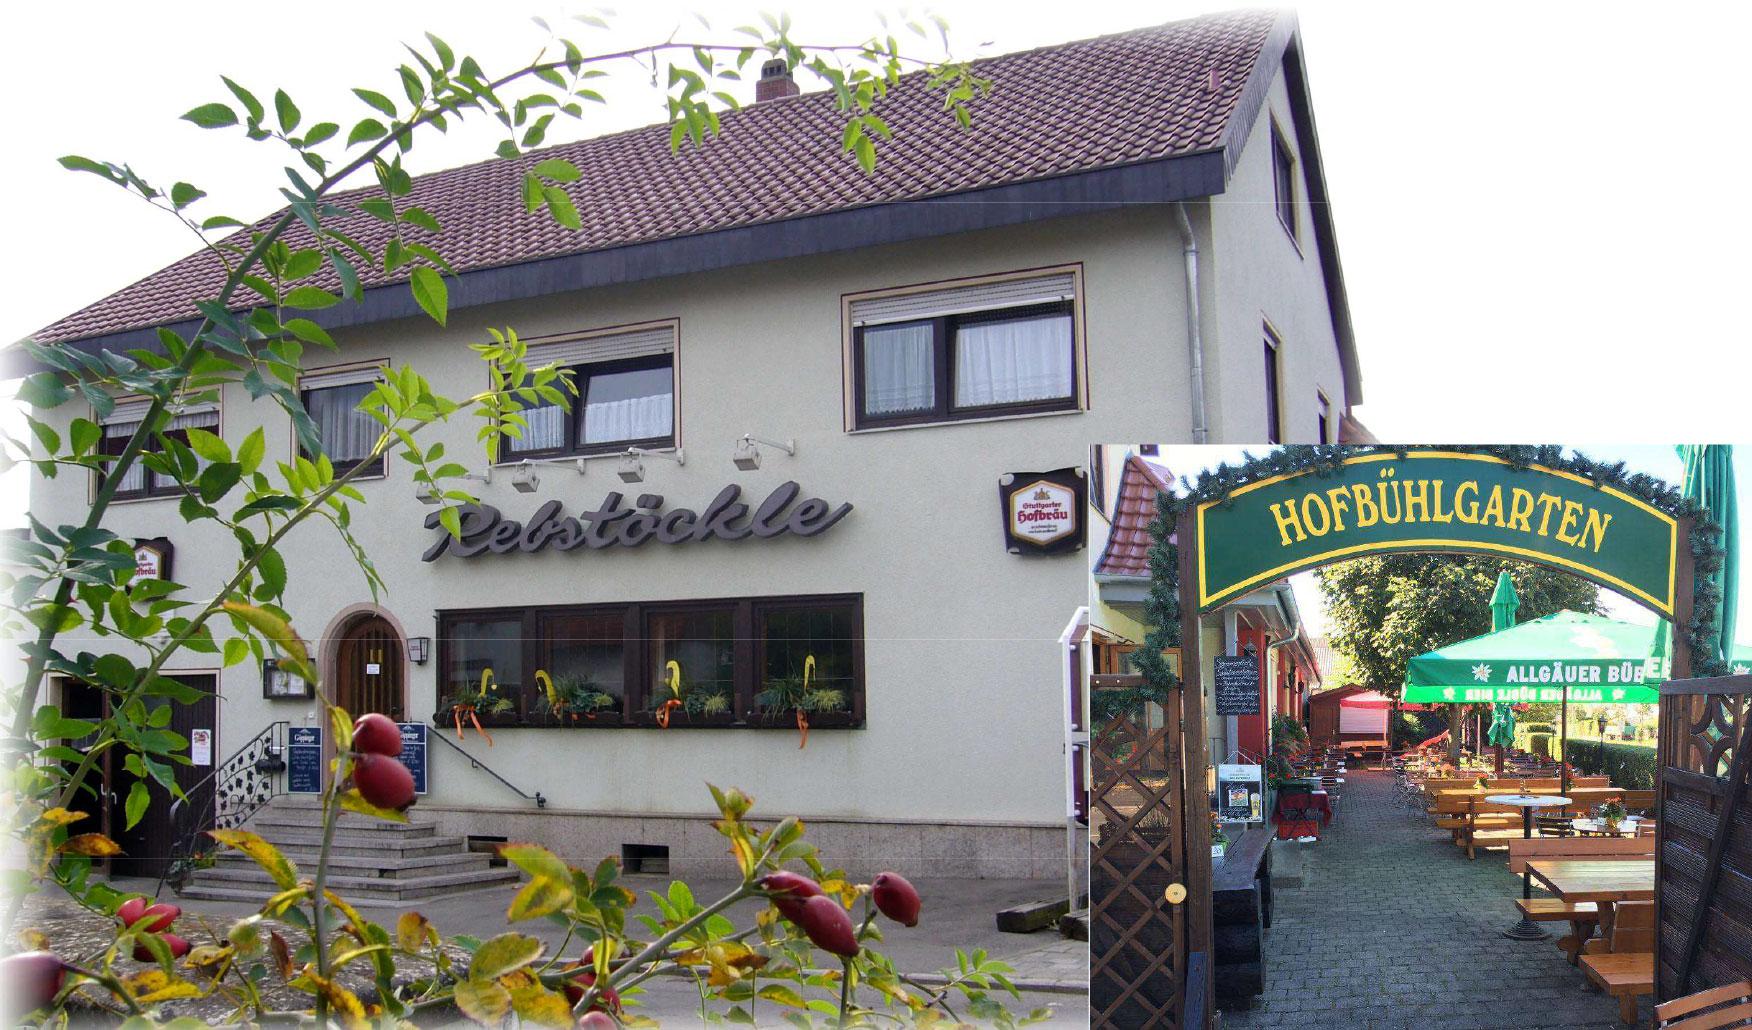 taraba-gästehaus restaurant rebstöckle metzingen neuhausen